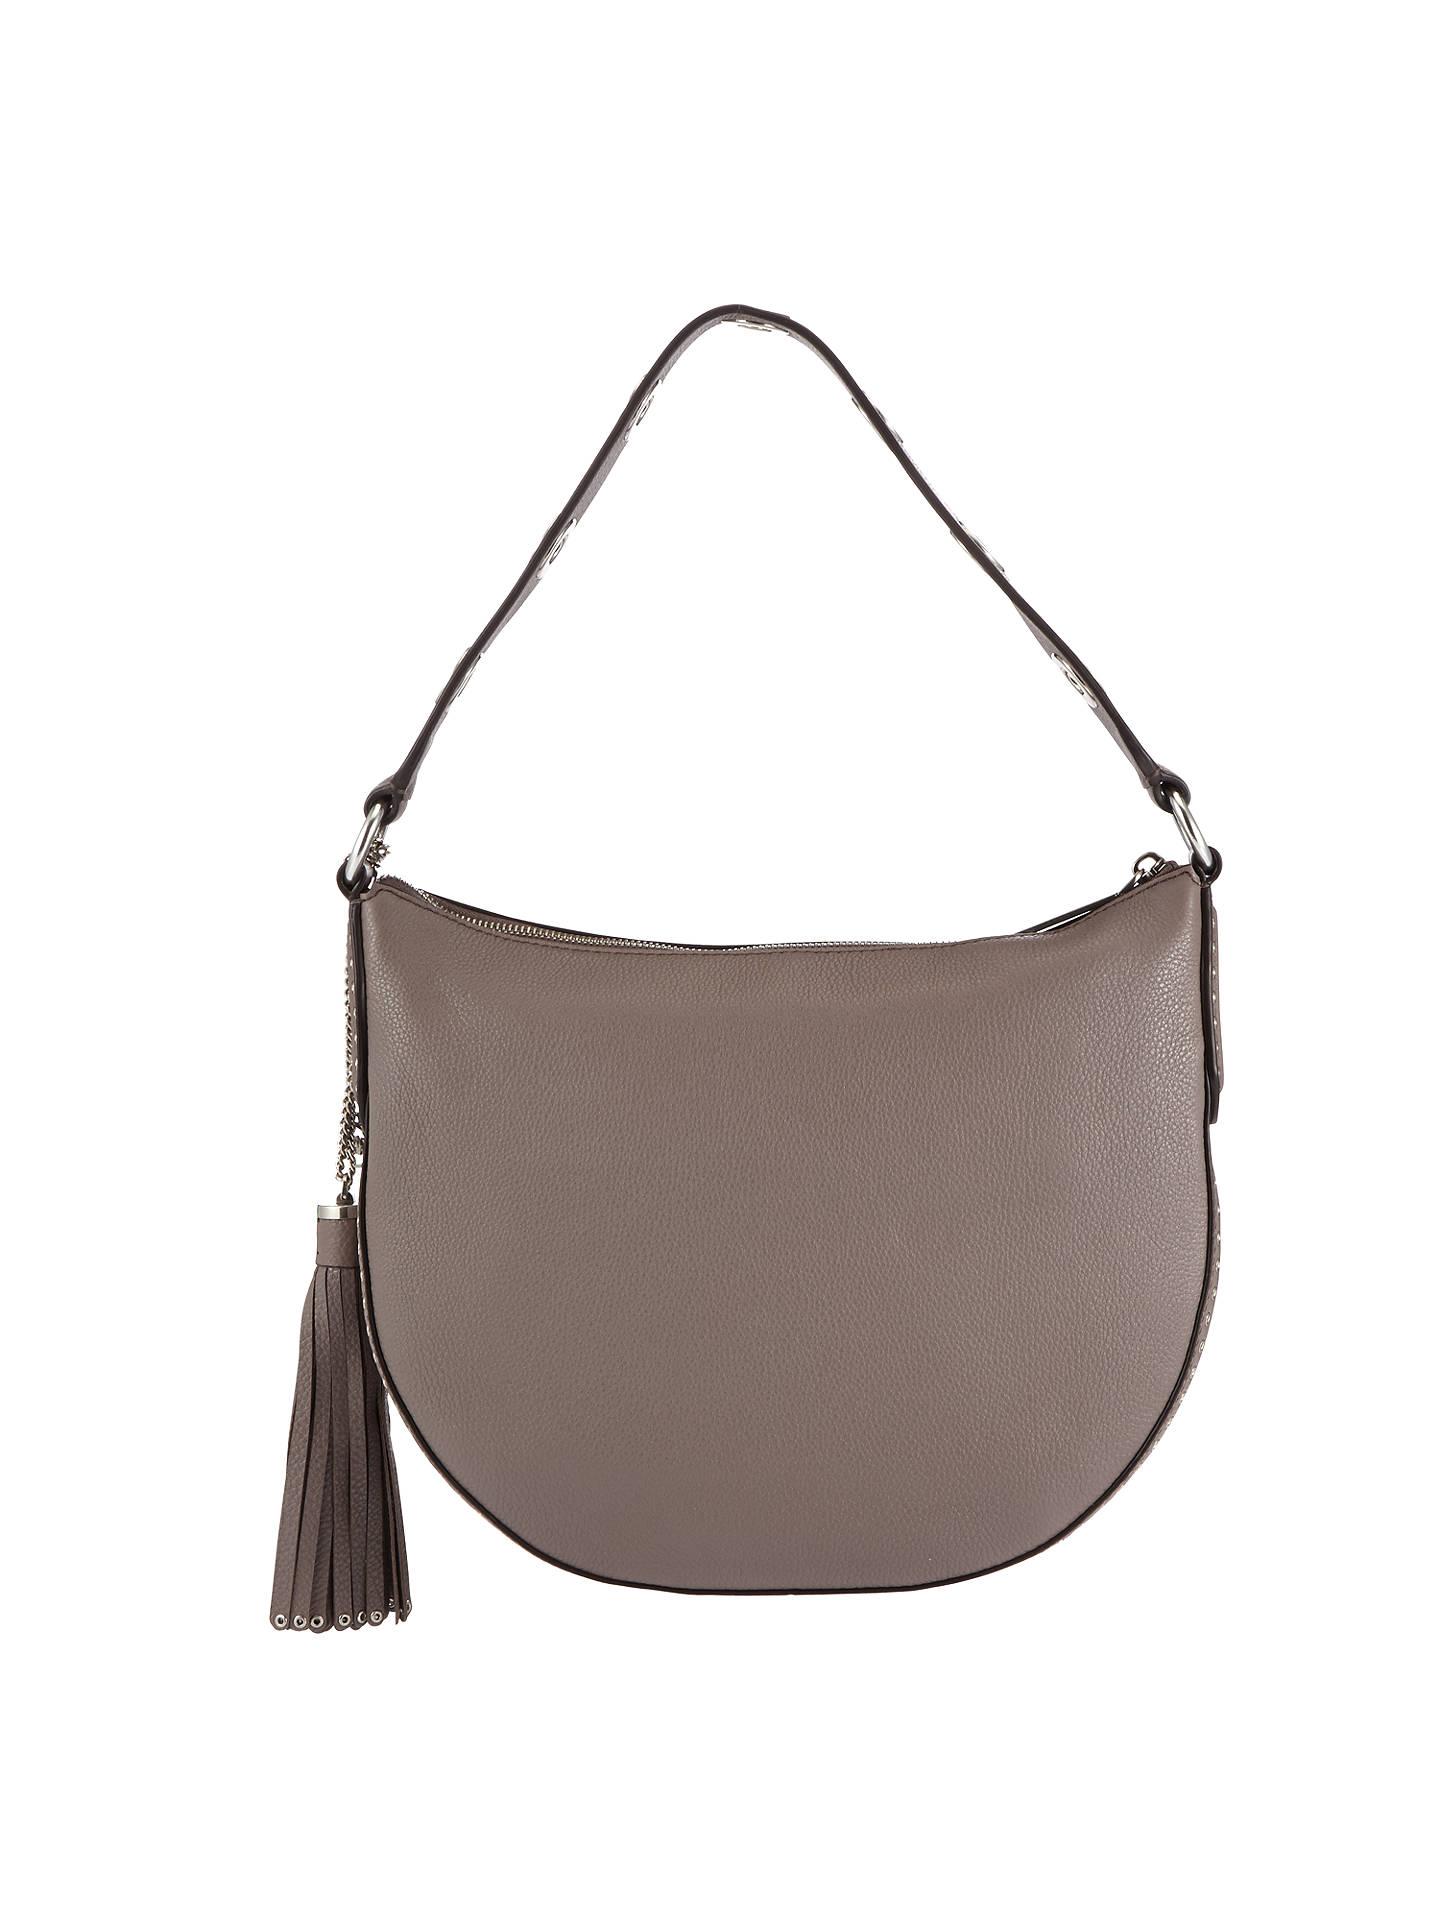 6c8d9602e010 Buy MICHAEL Michael Kors Brooklyn Large Convertible Leather Hobo Bag,  Cinder Online at johnlewis.